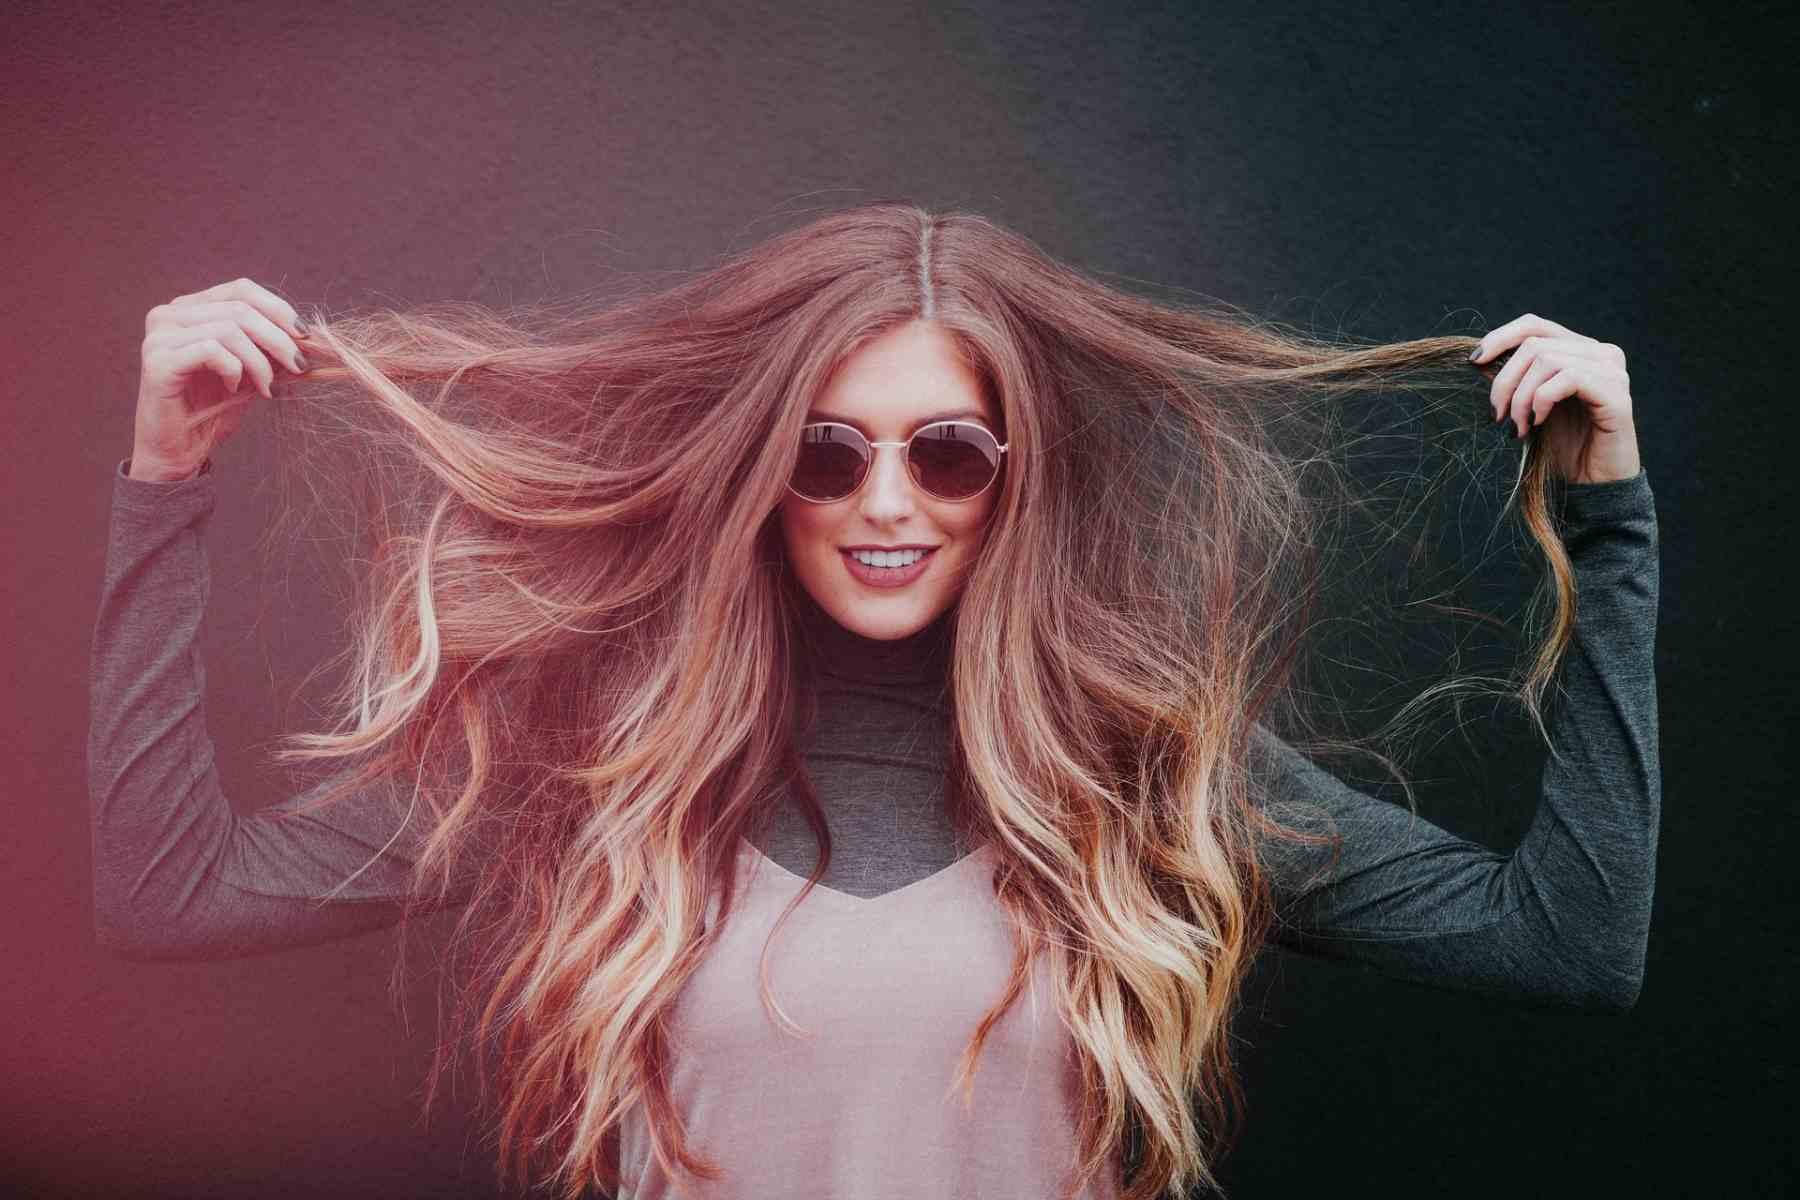 Haar-Transplantation bei Frauen | Frau mit vollem Haar